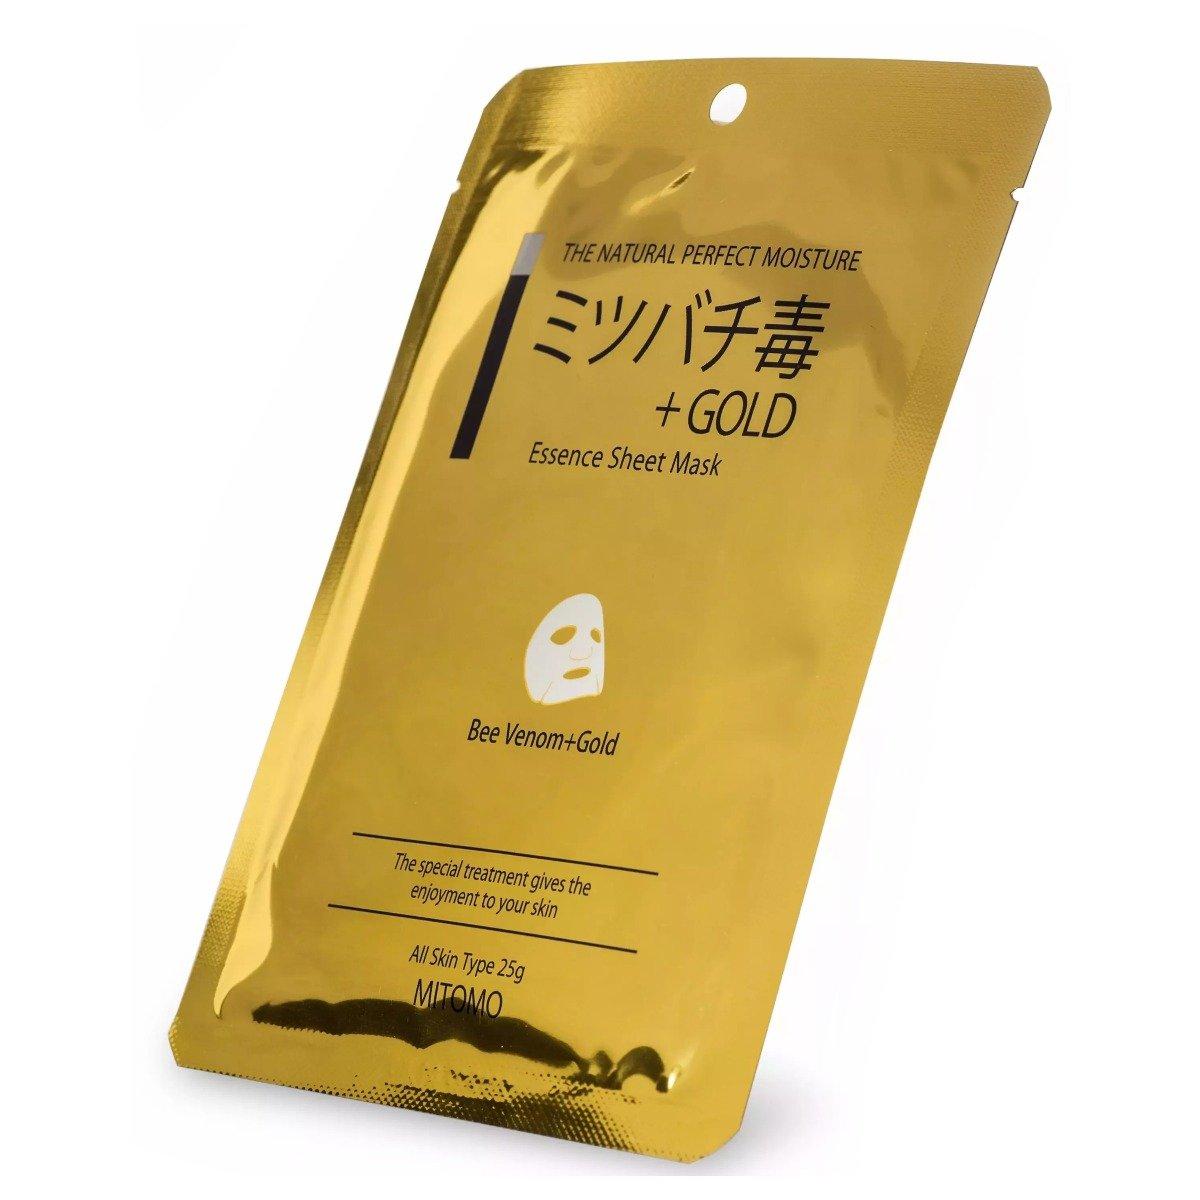 Masca pentru fata Mitomo Bee Venom + Gold, 1 buc imagine